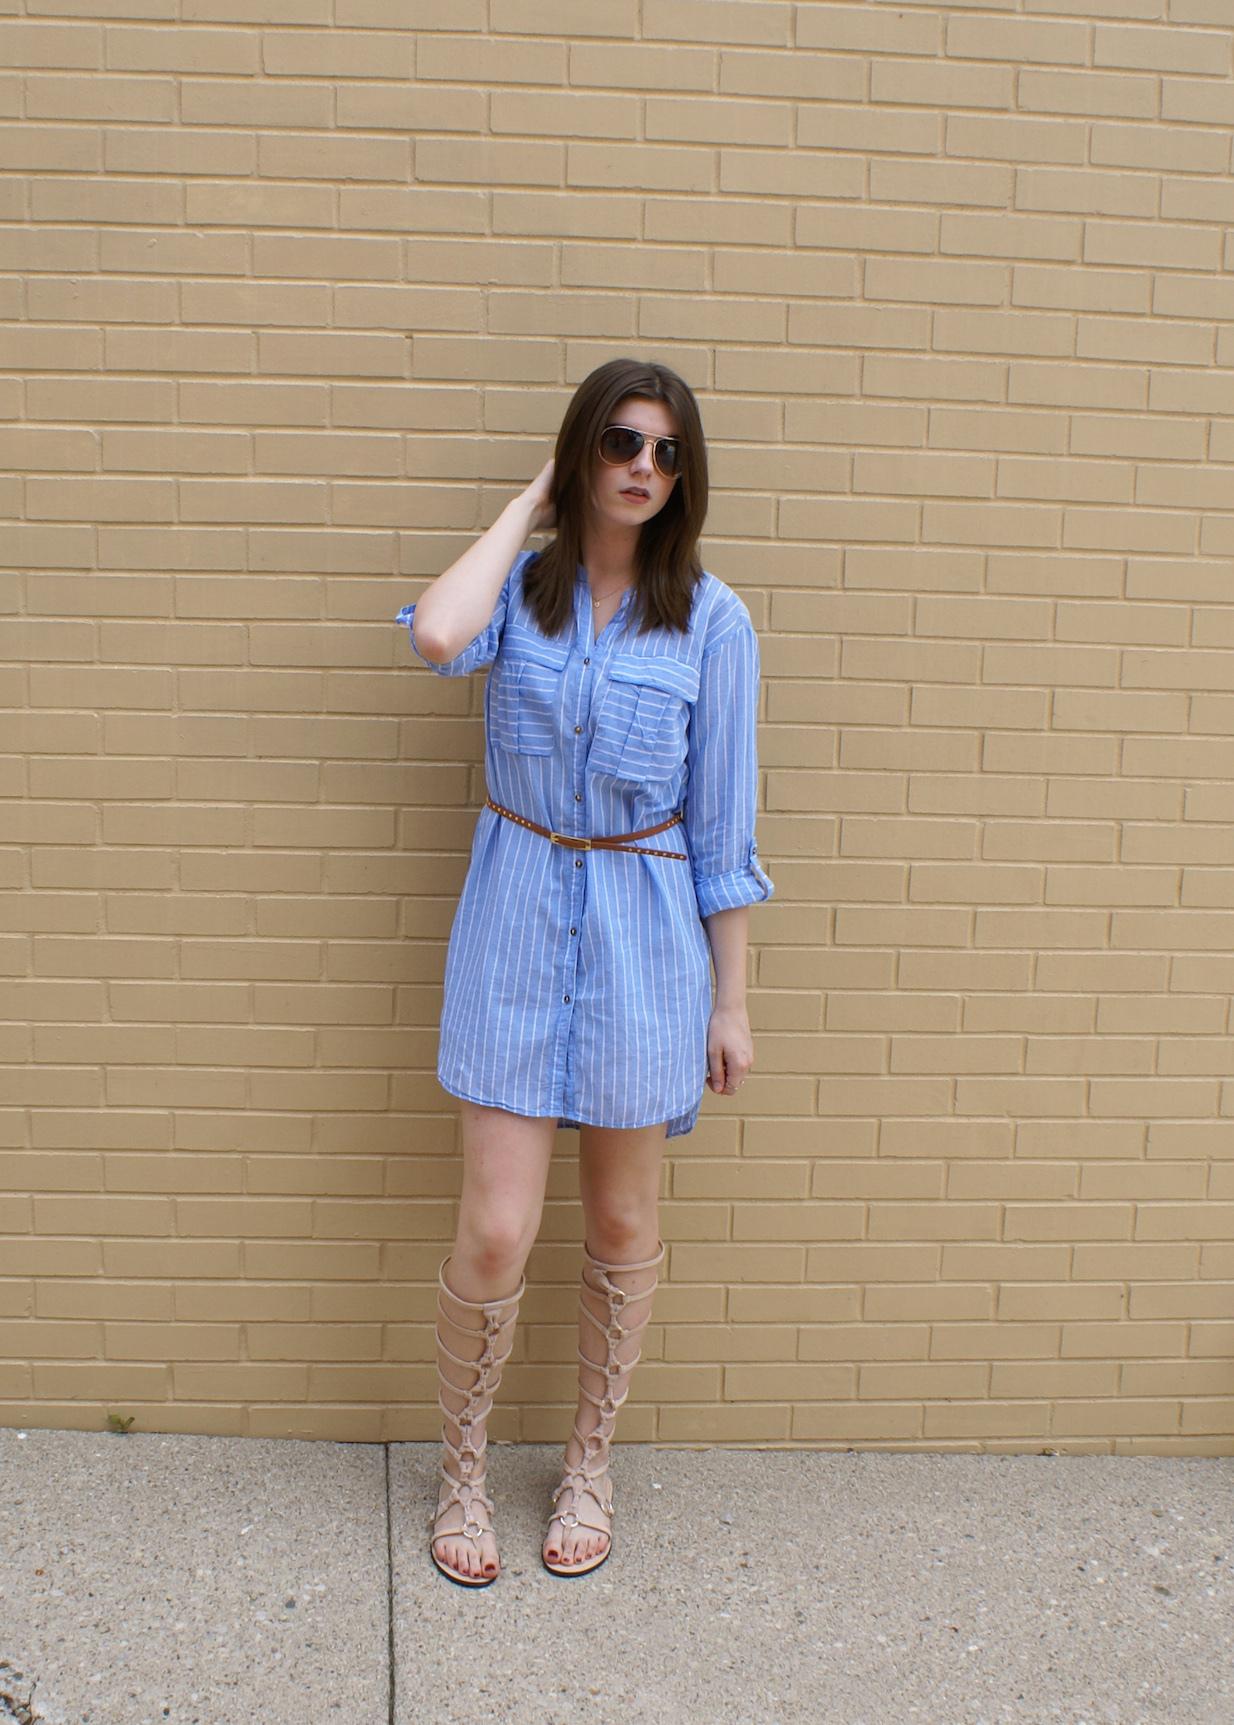 Tenue: Robe chemise à rayures verticales bleue, Sandales